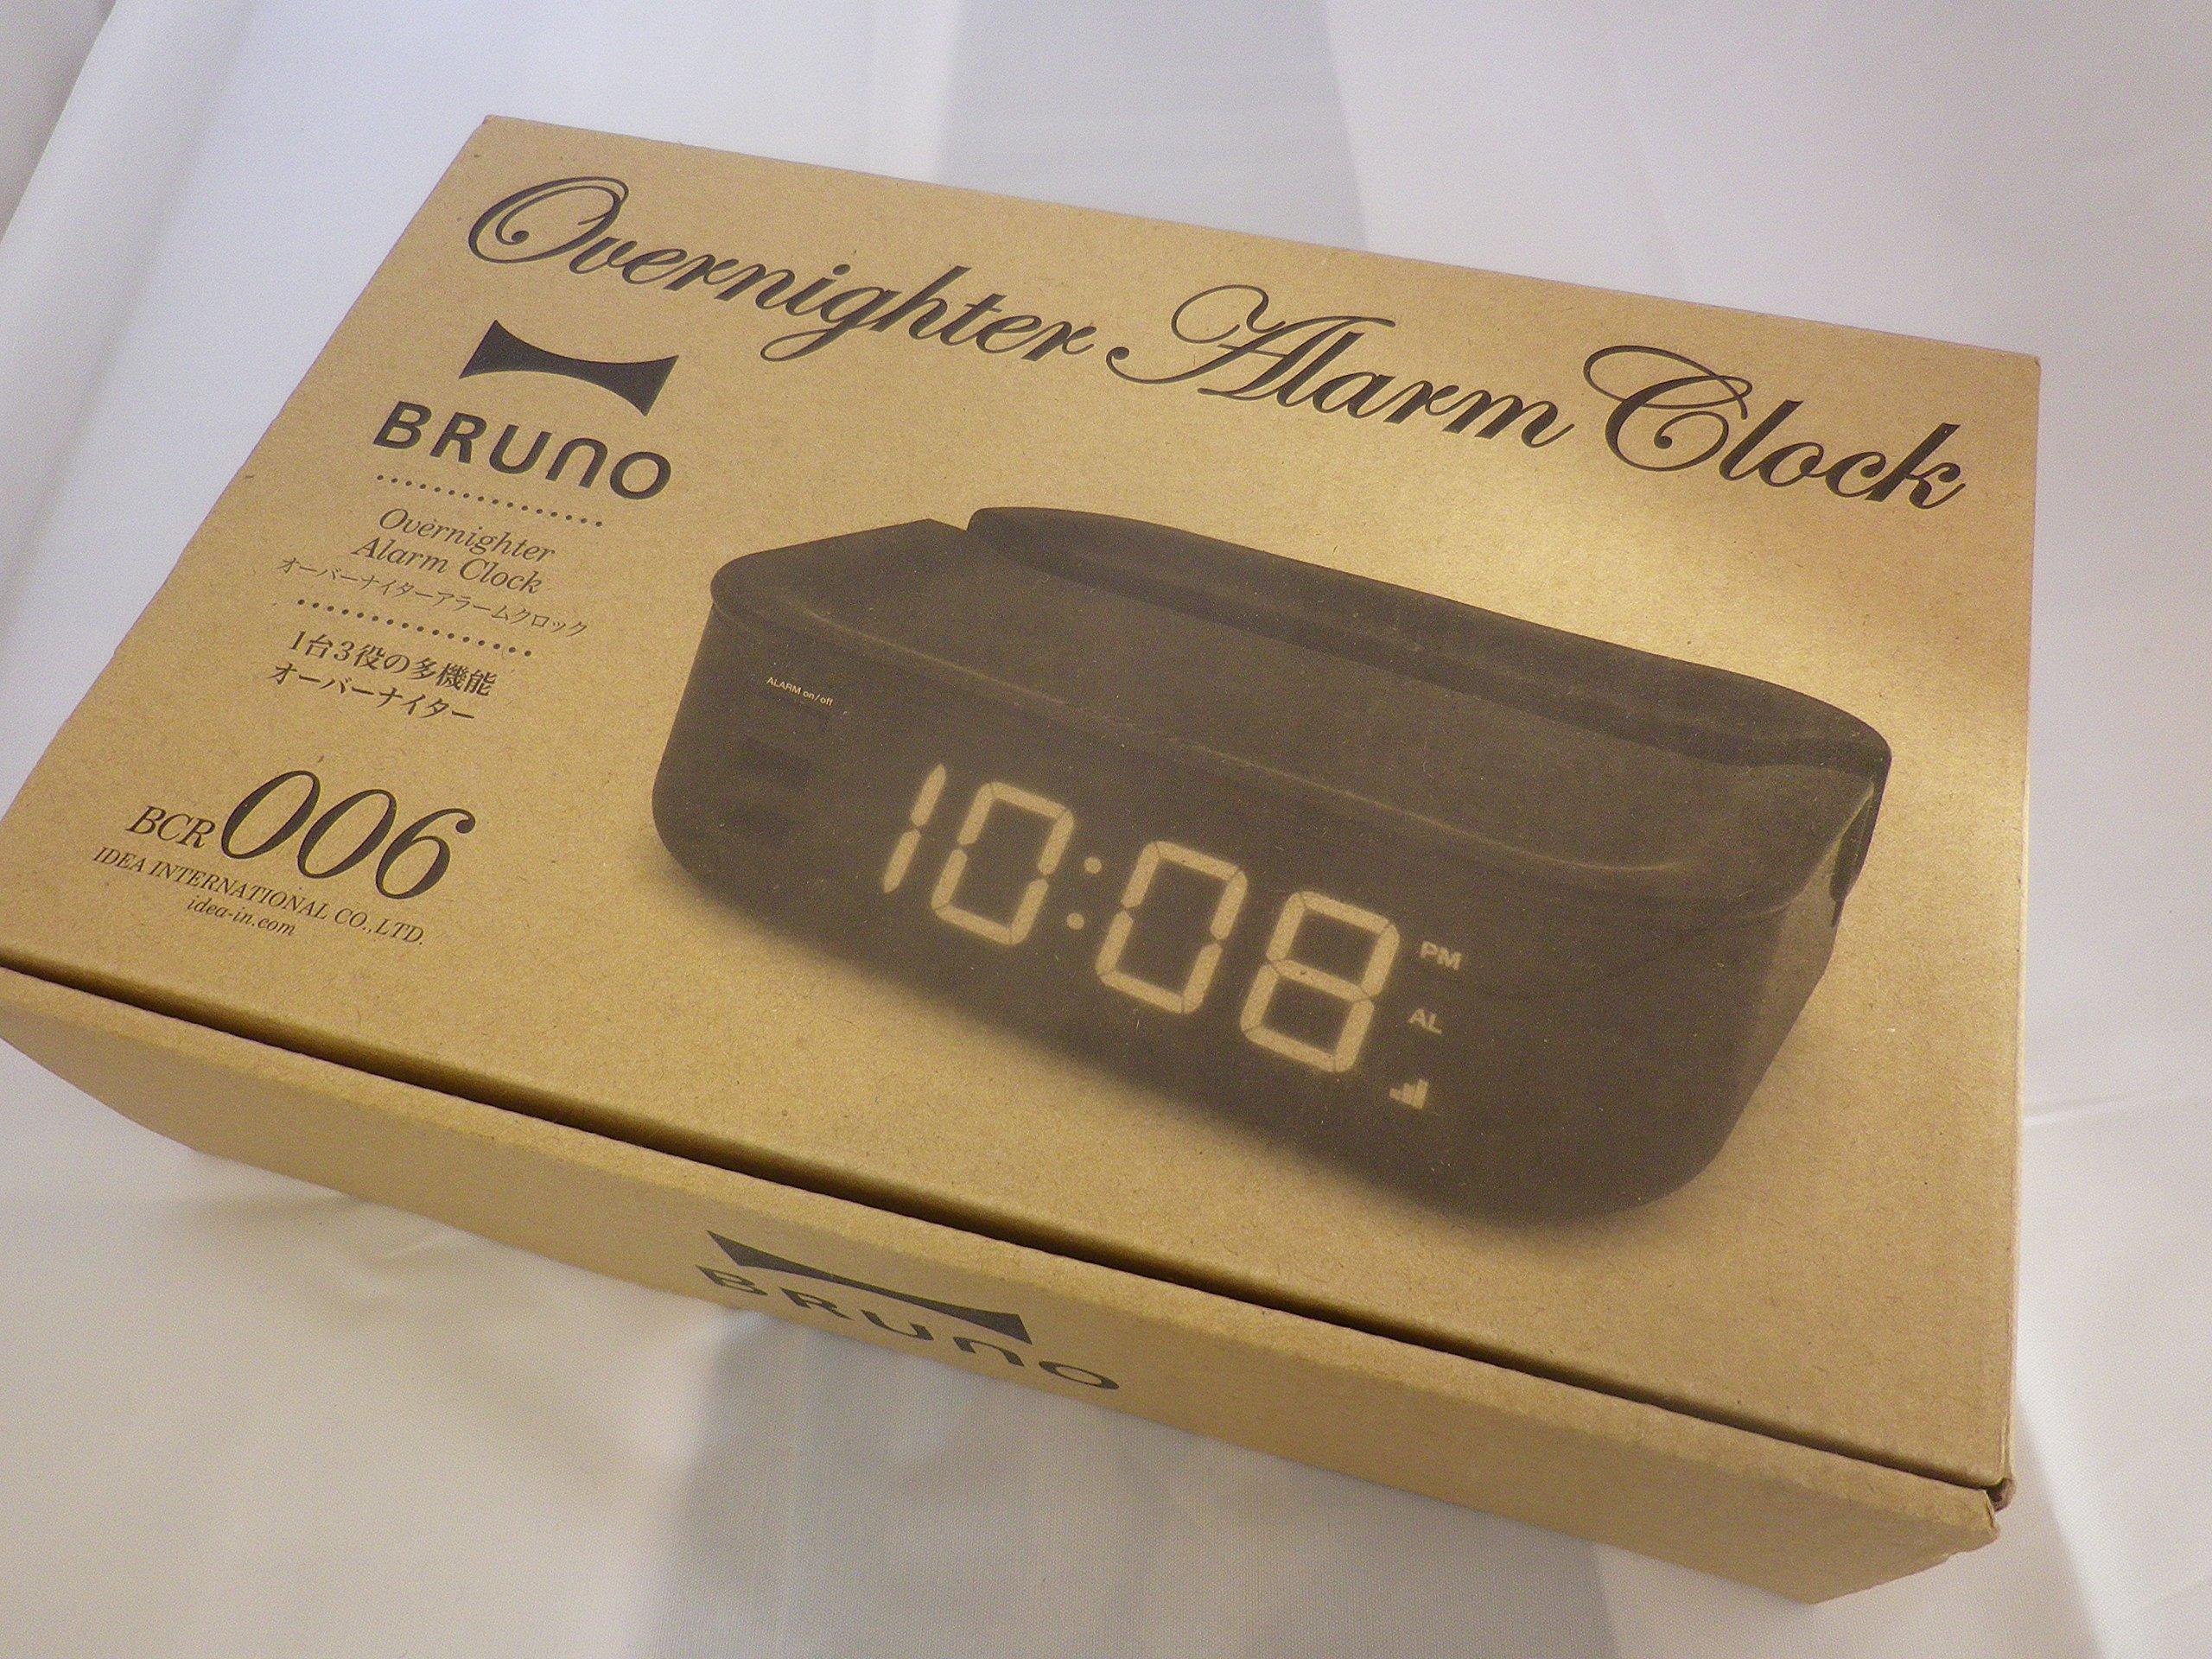 Multi-function Bruno White 3 in 1 (Bruno) Over-night Game Alarm Clock